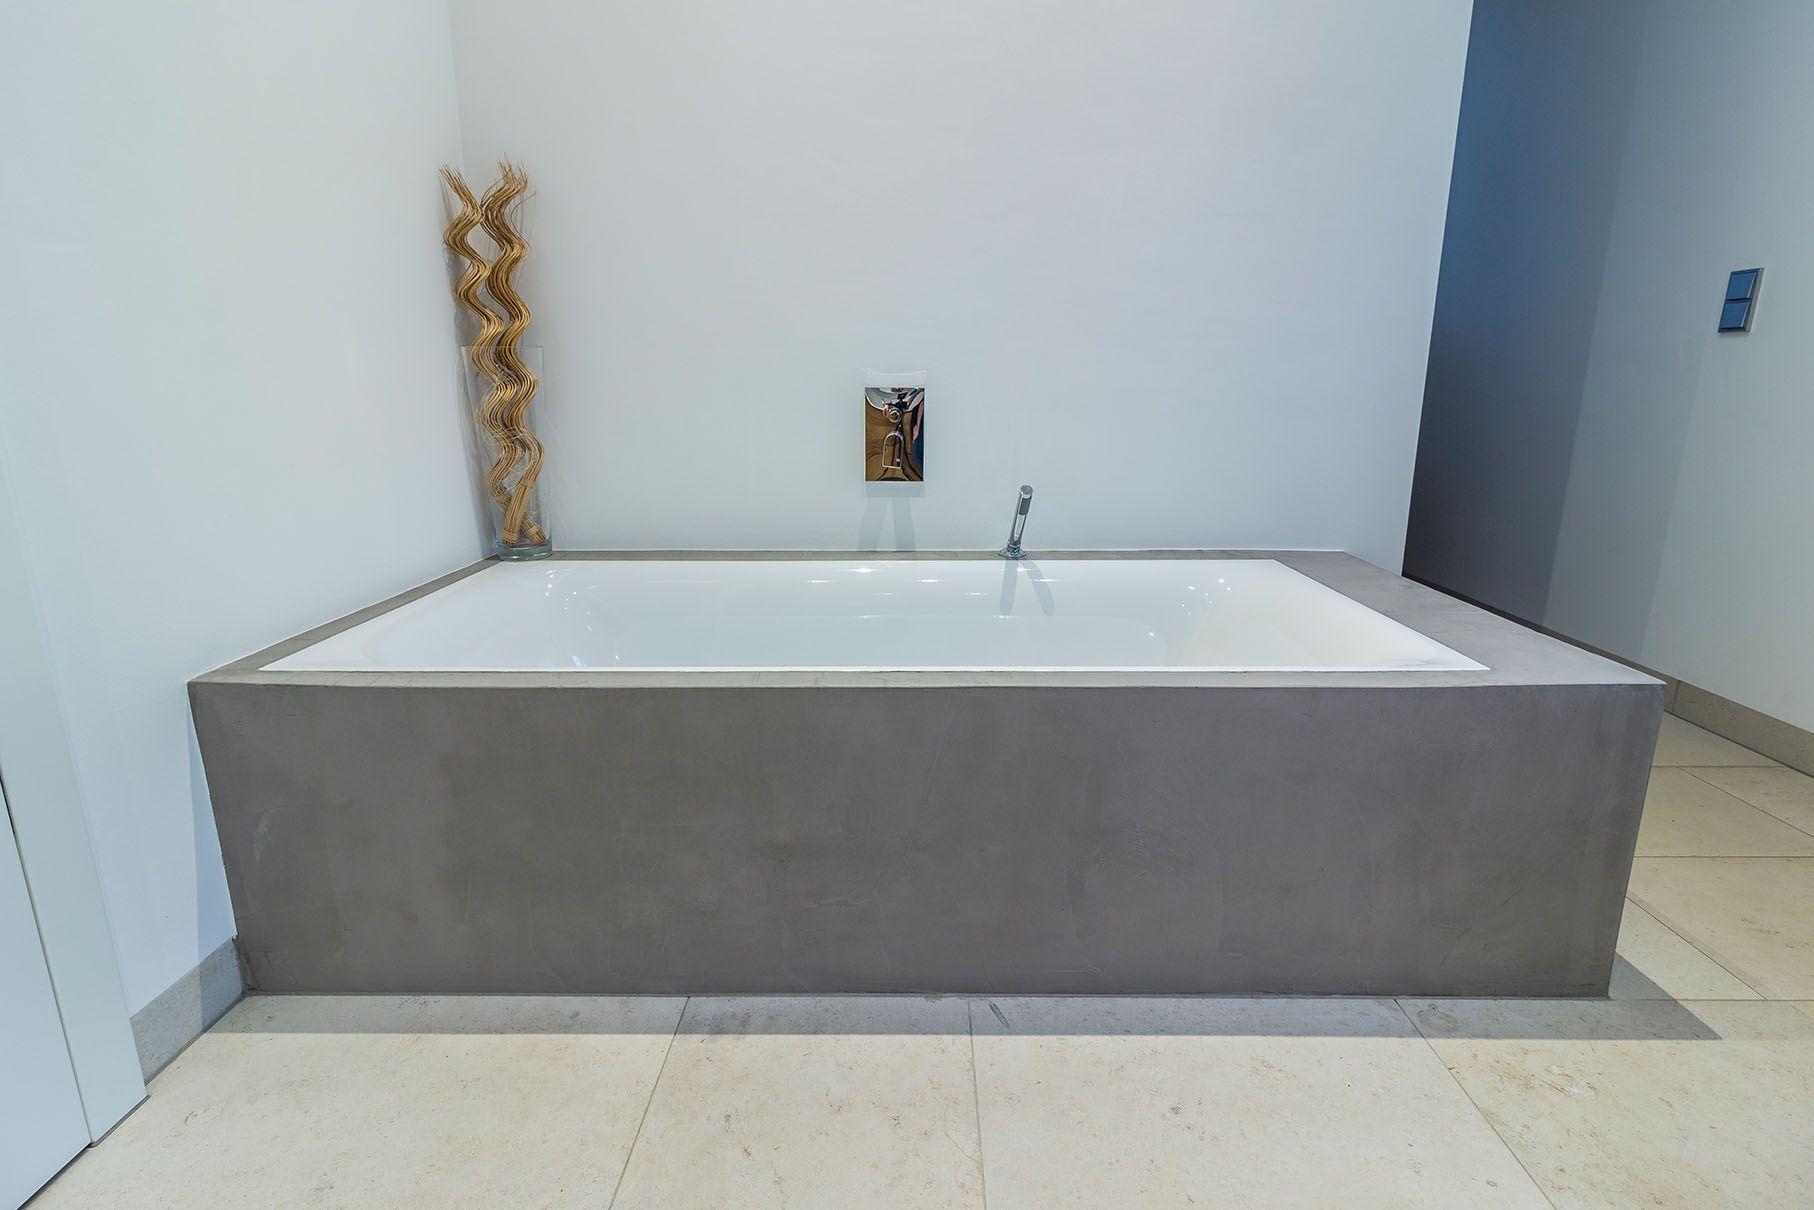 Badewanne In Beton Badewanne Beton Badewanne Badezimmer Umgestalten